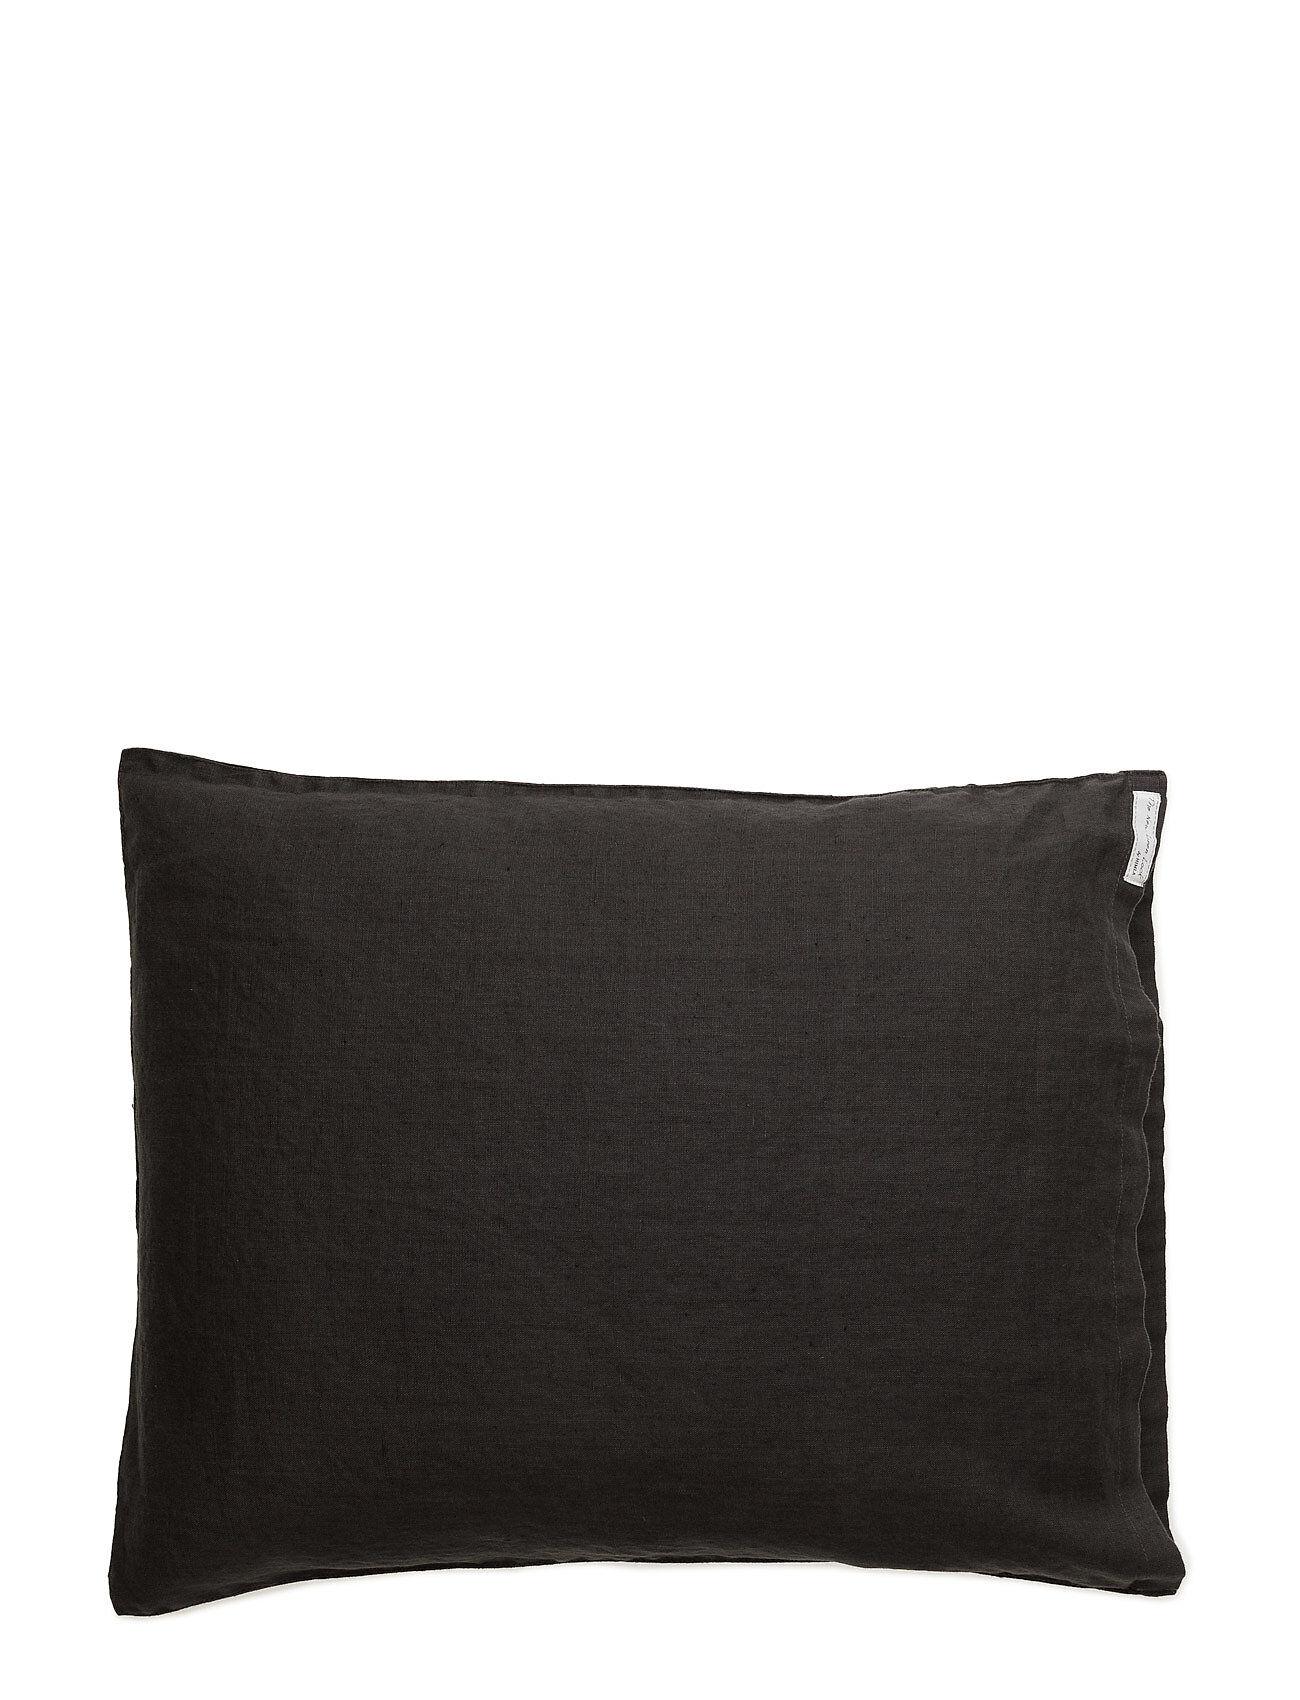 Himla Sunshine Pillowcase Home Bedroom Pillowcases Musta Himla